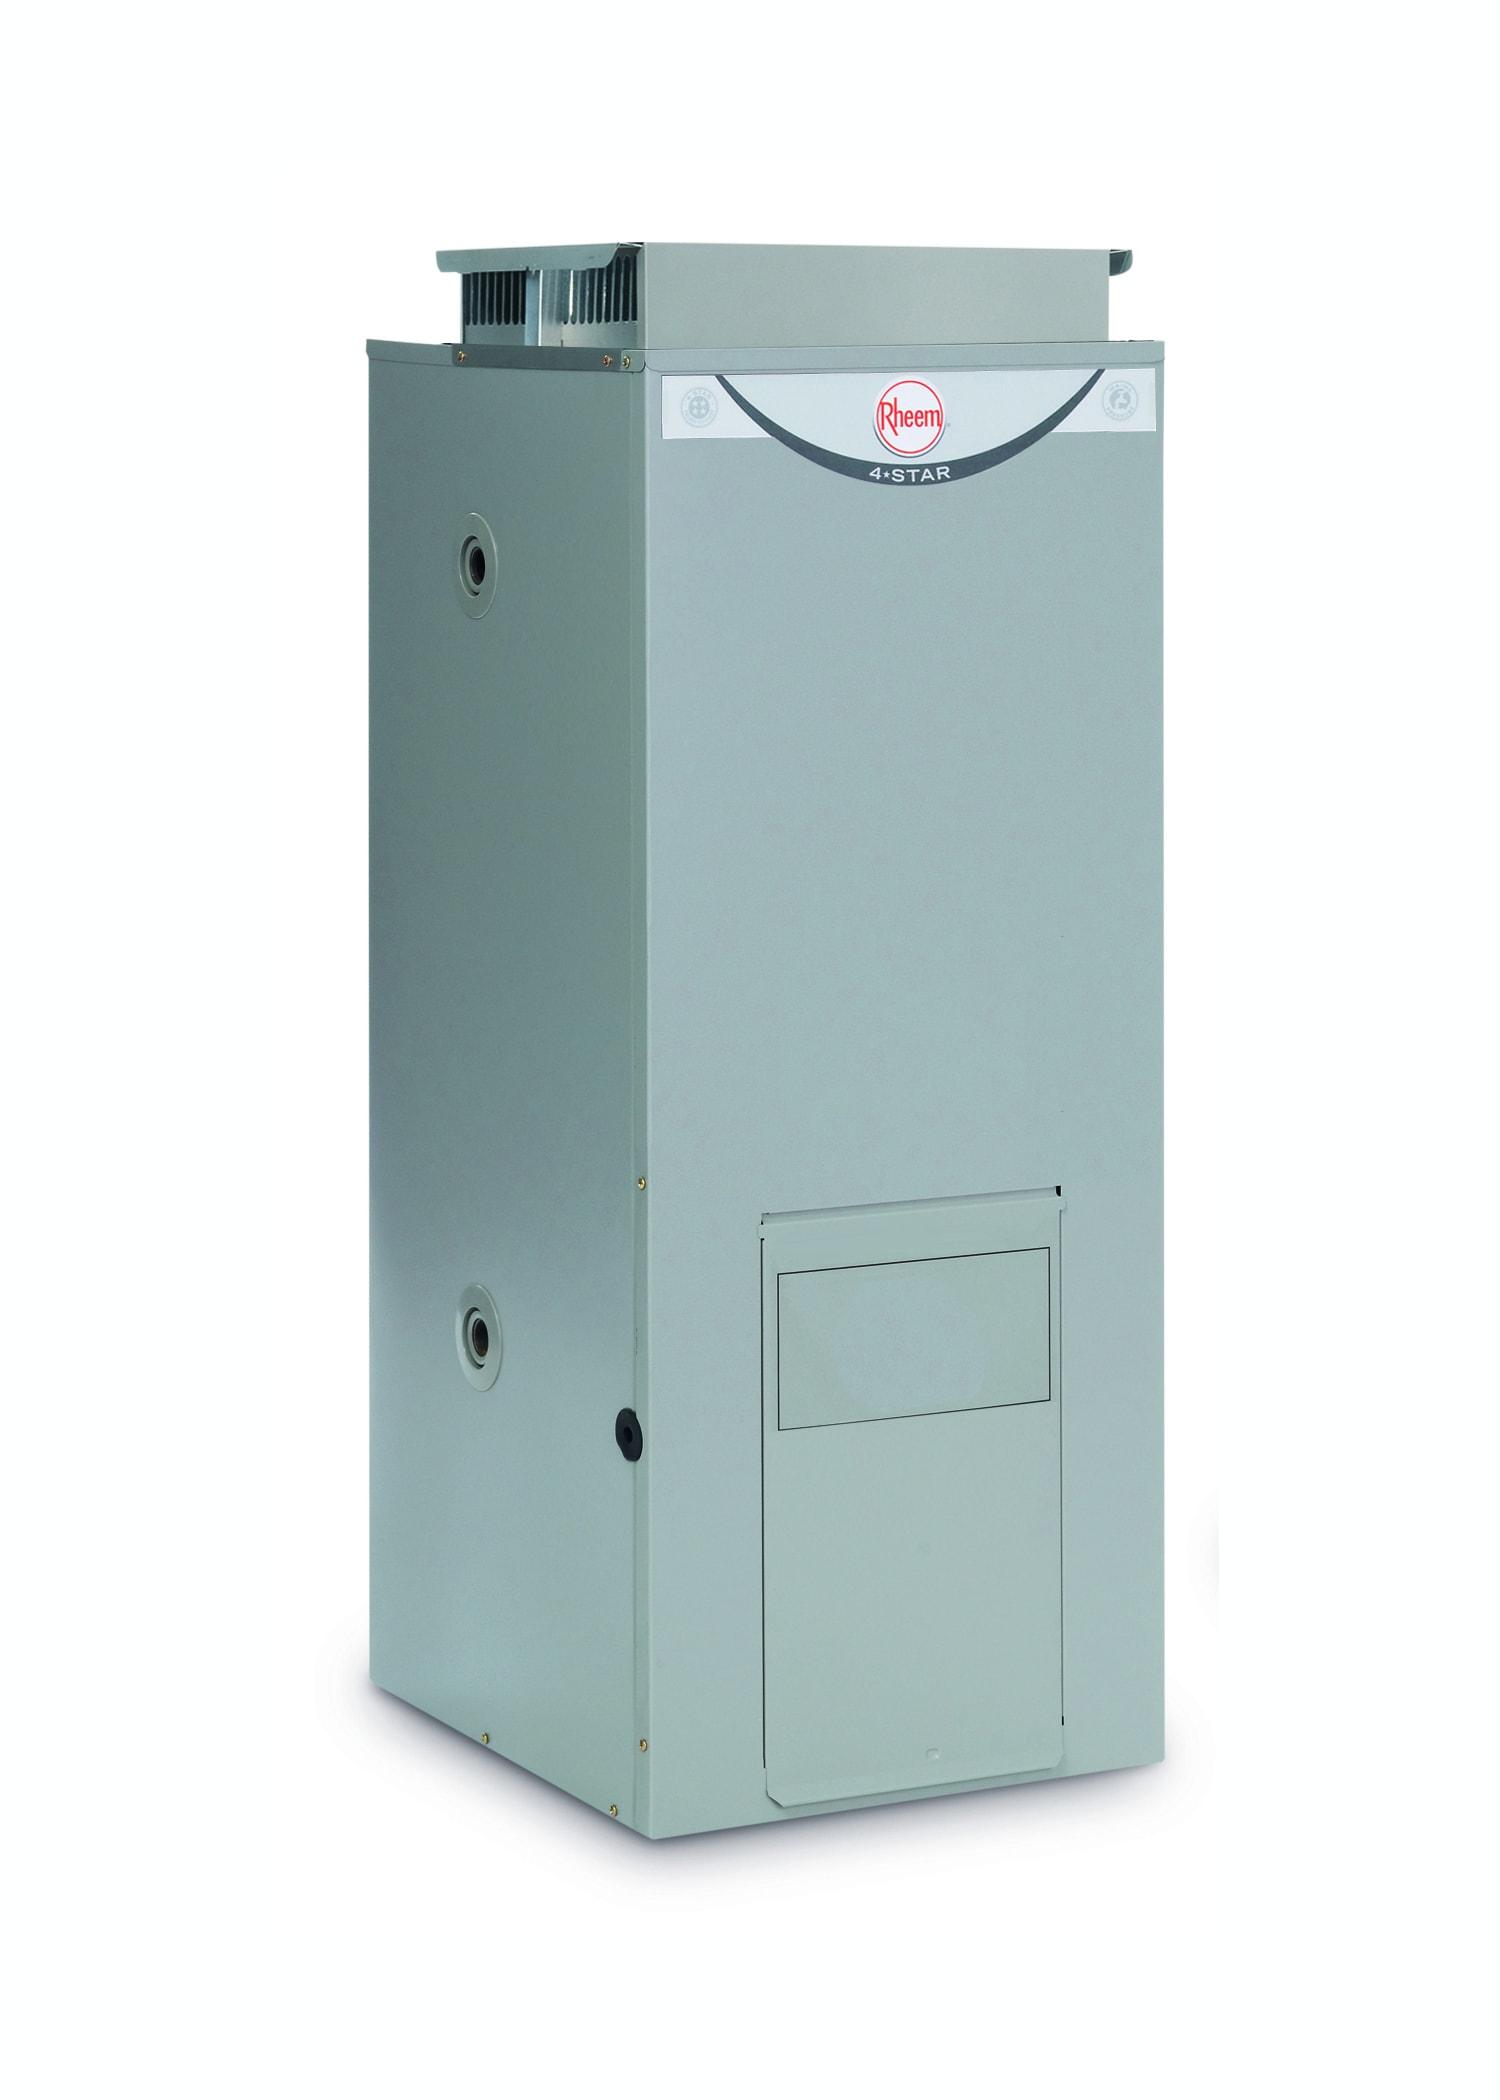 Rheem 4 Star 90L Gas Hot Water System